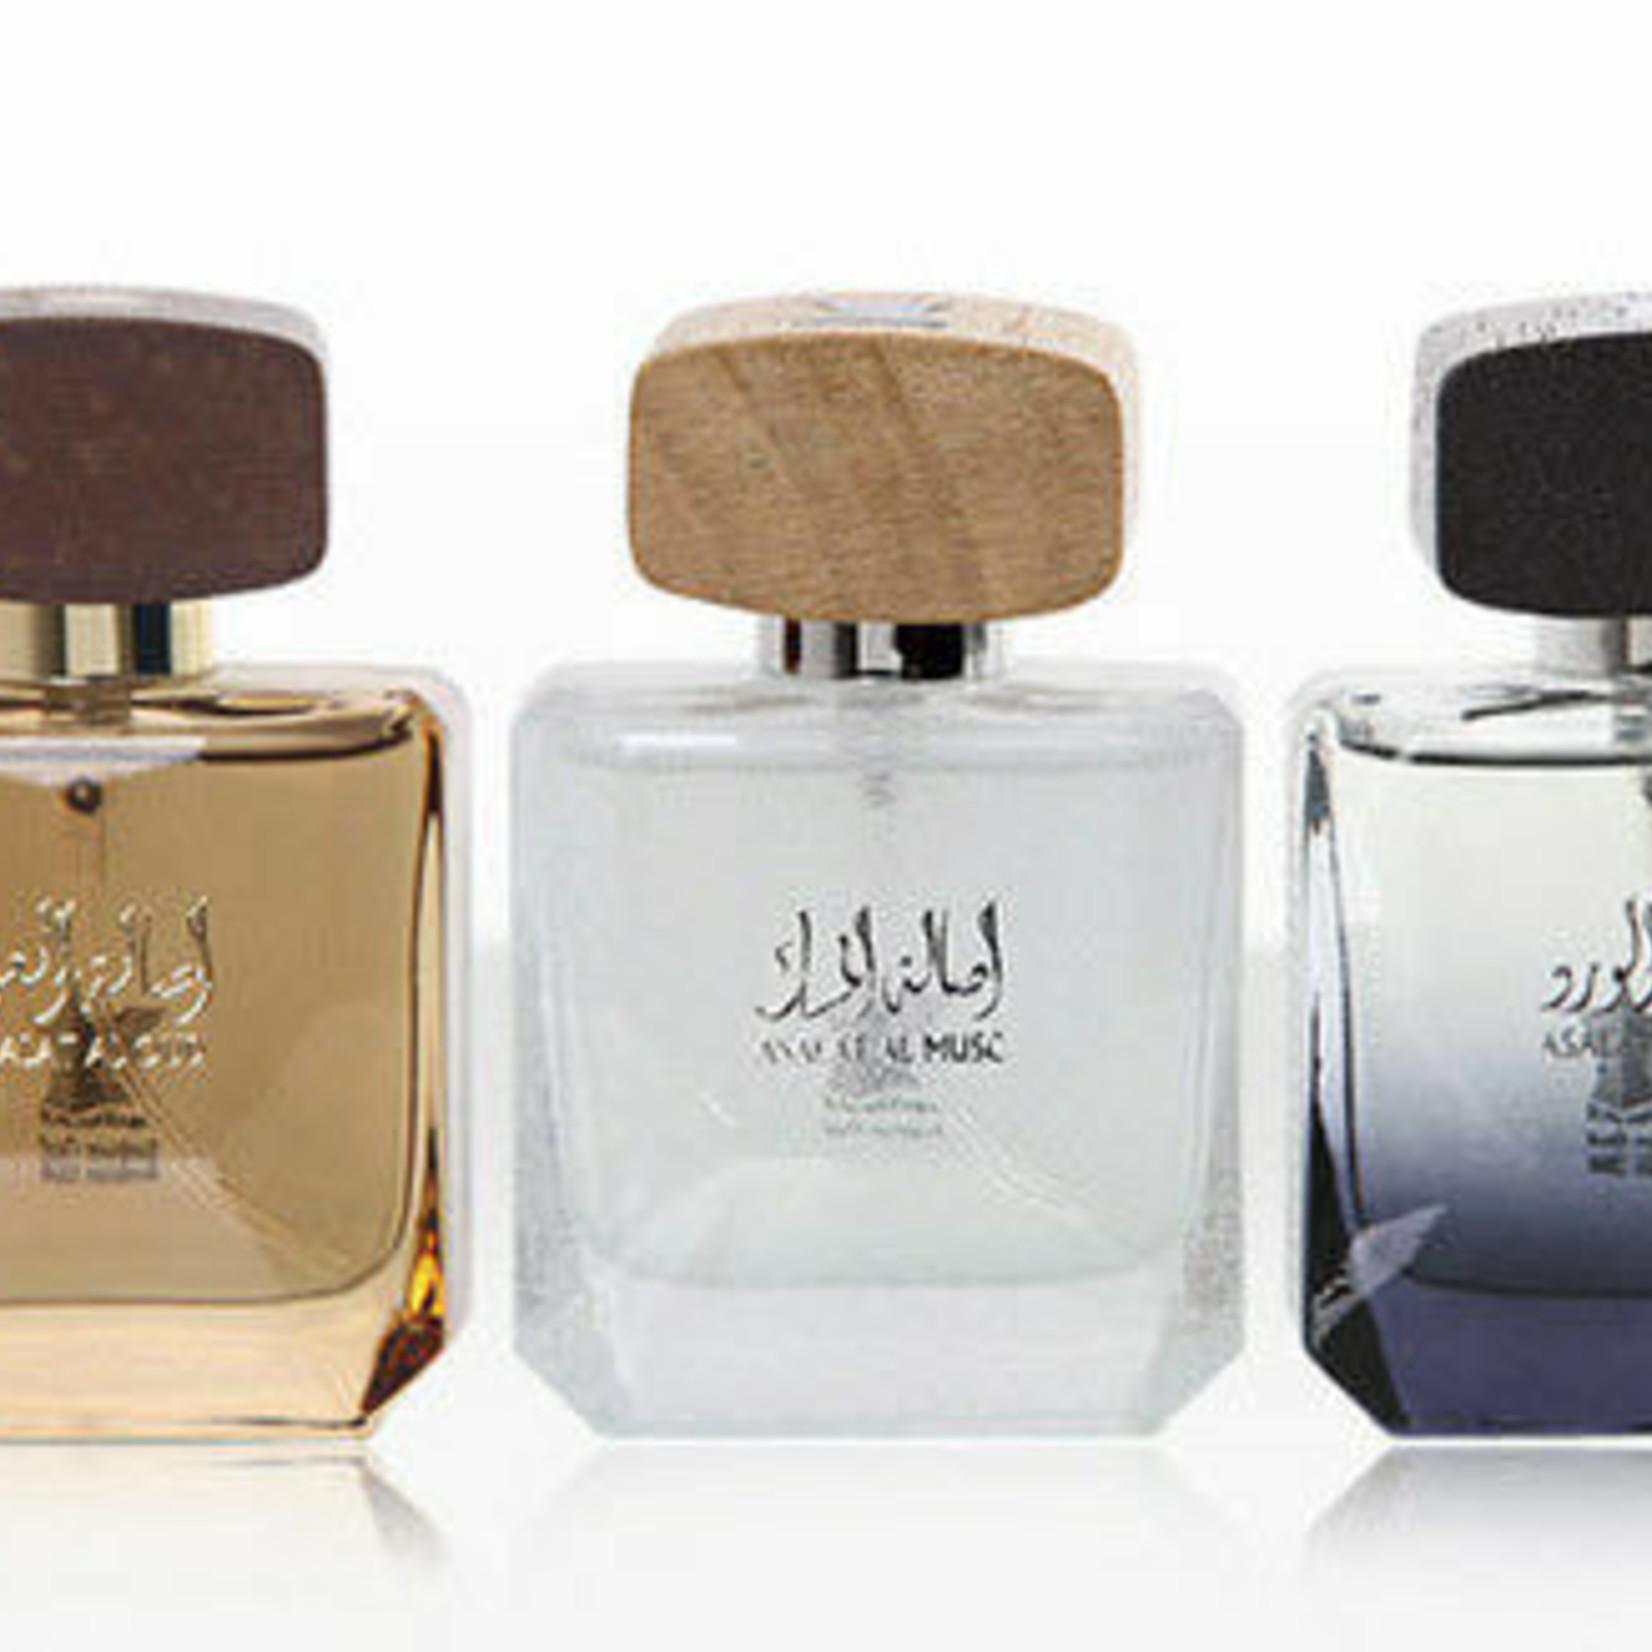 Arabian Oud Asala Collection (3x 30ML)